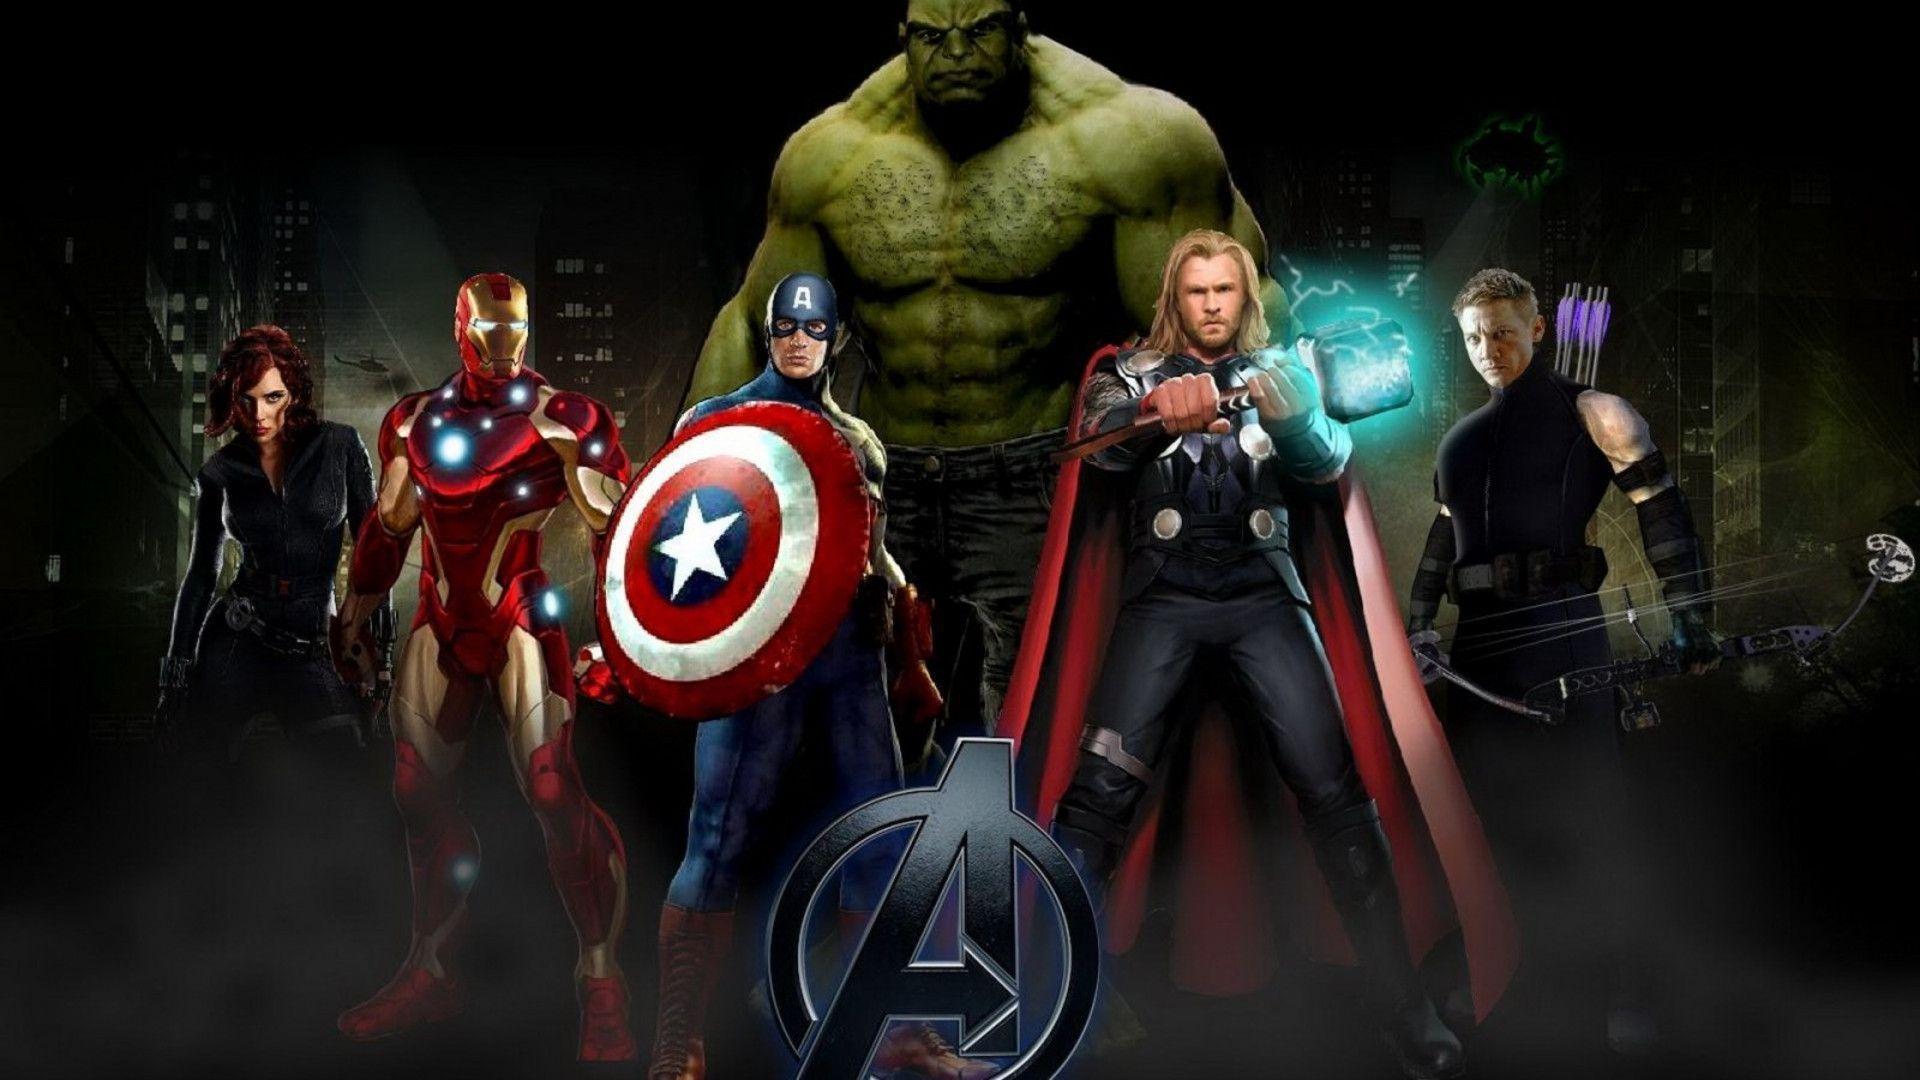 Wallpapers For > Avengers Wallpaper Hd 1920x1080